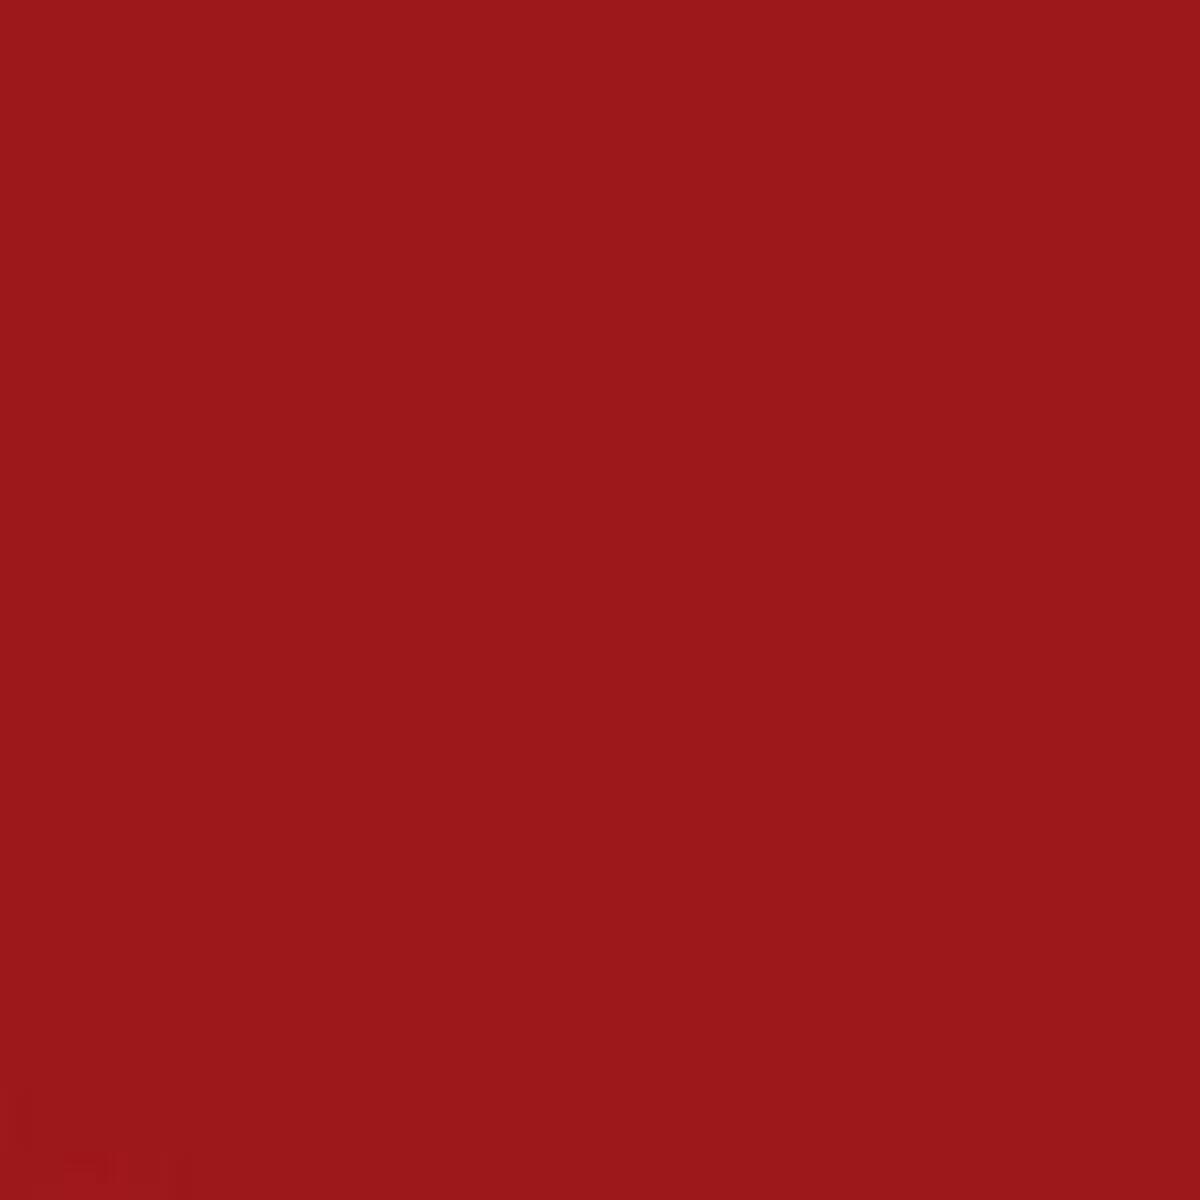 Bild 2 von BAUFIX natural Express-Deckfarbe skandinavisch rot